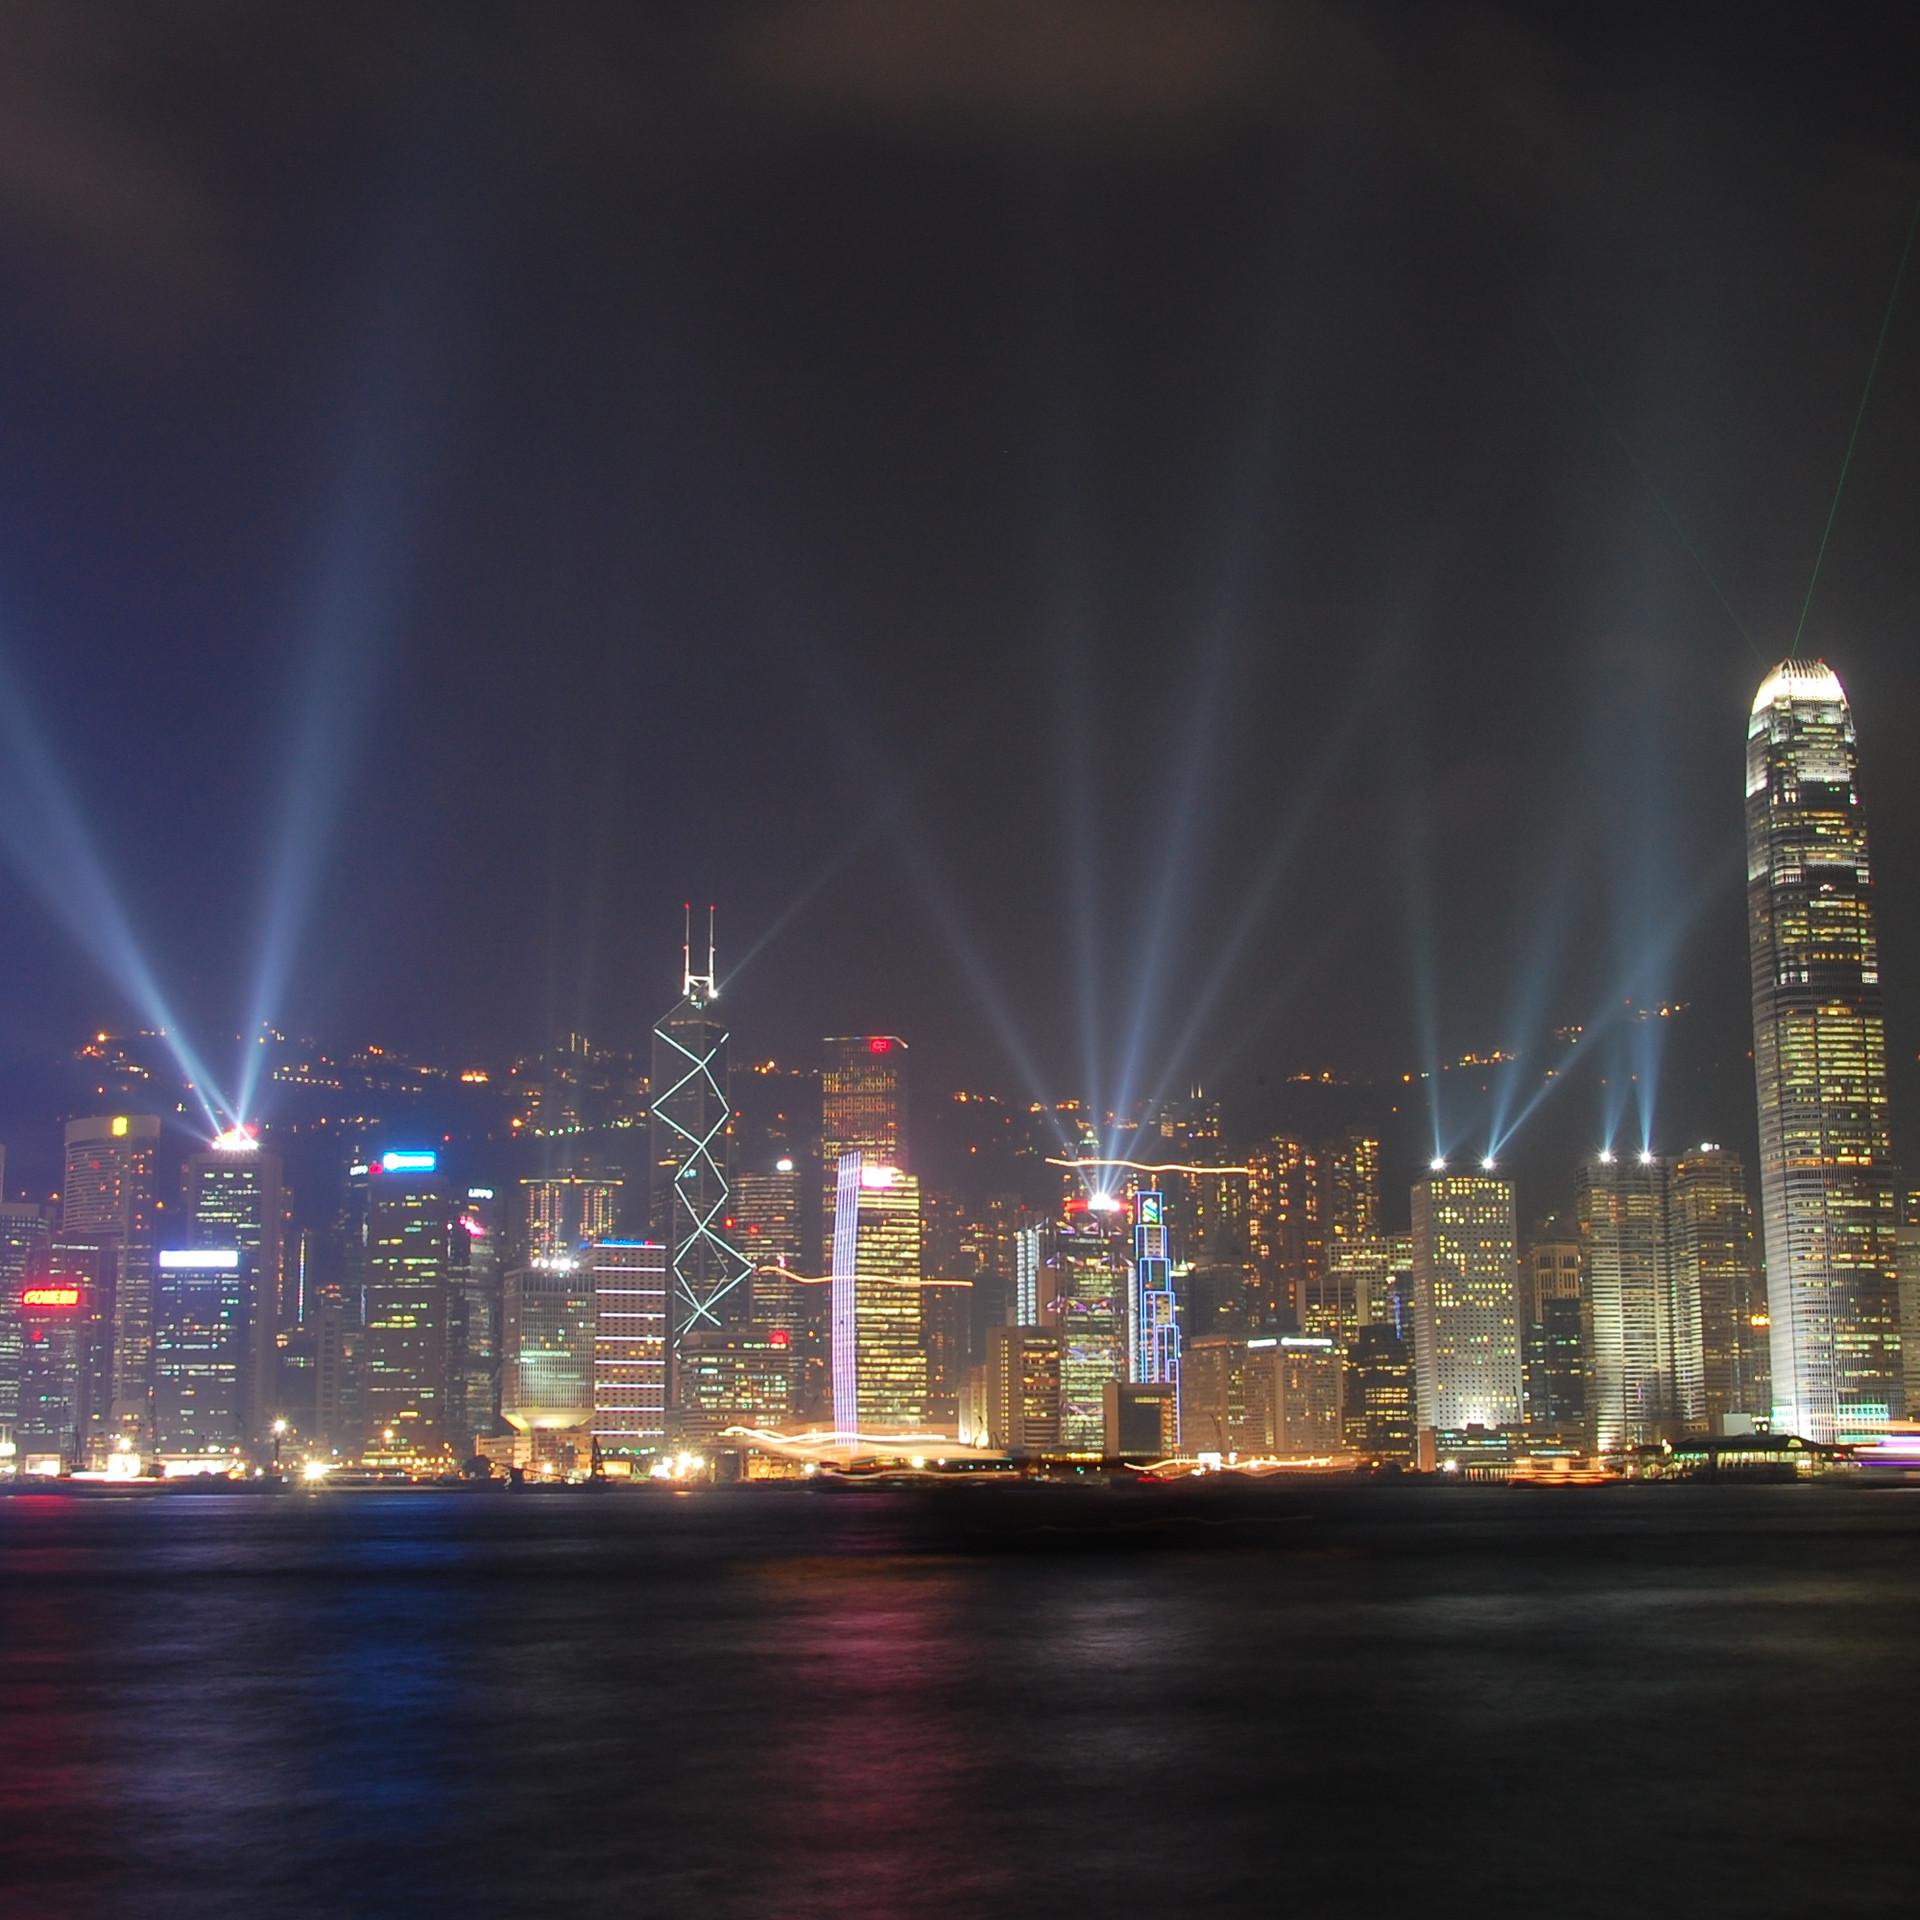 Hong Kong, 2009